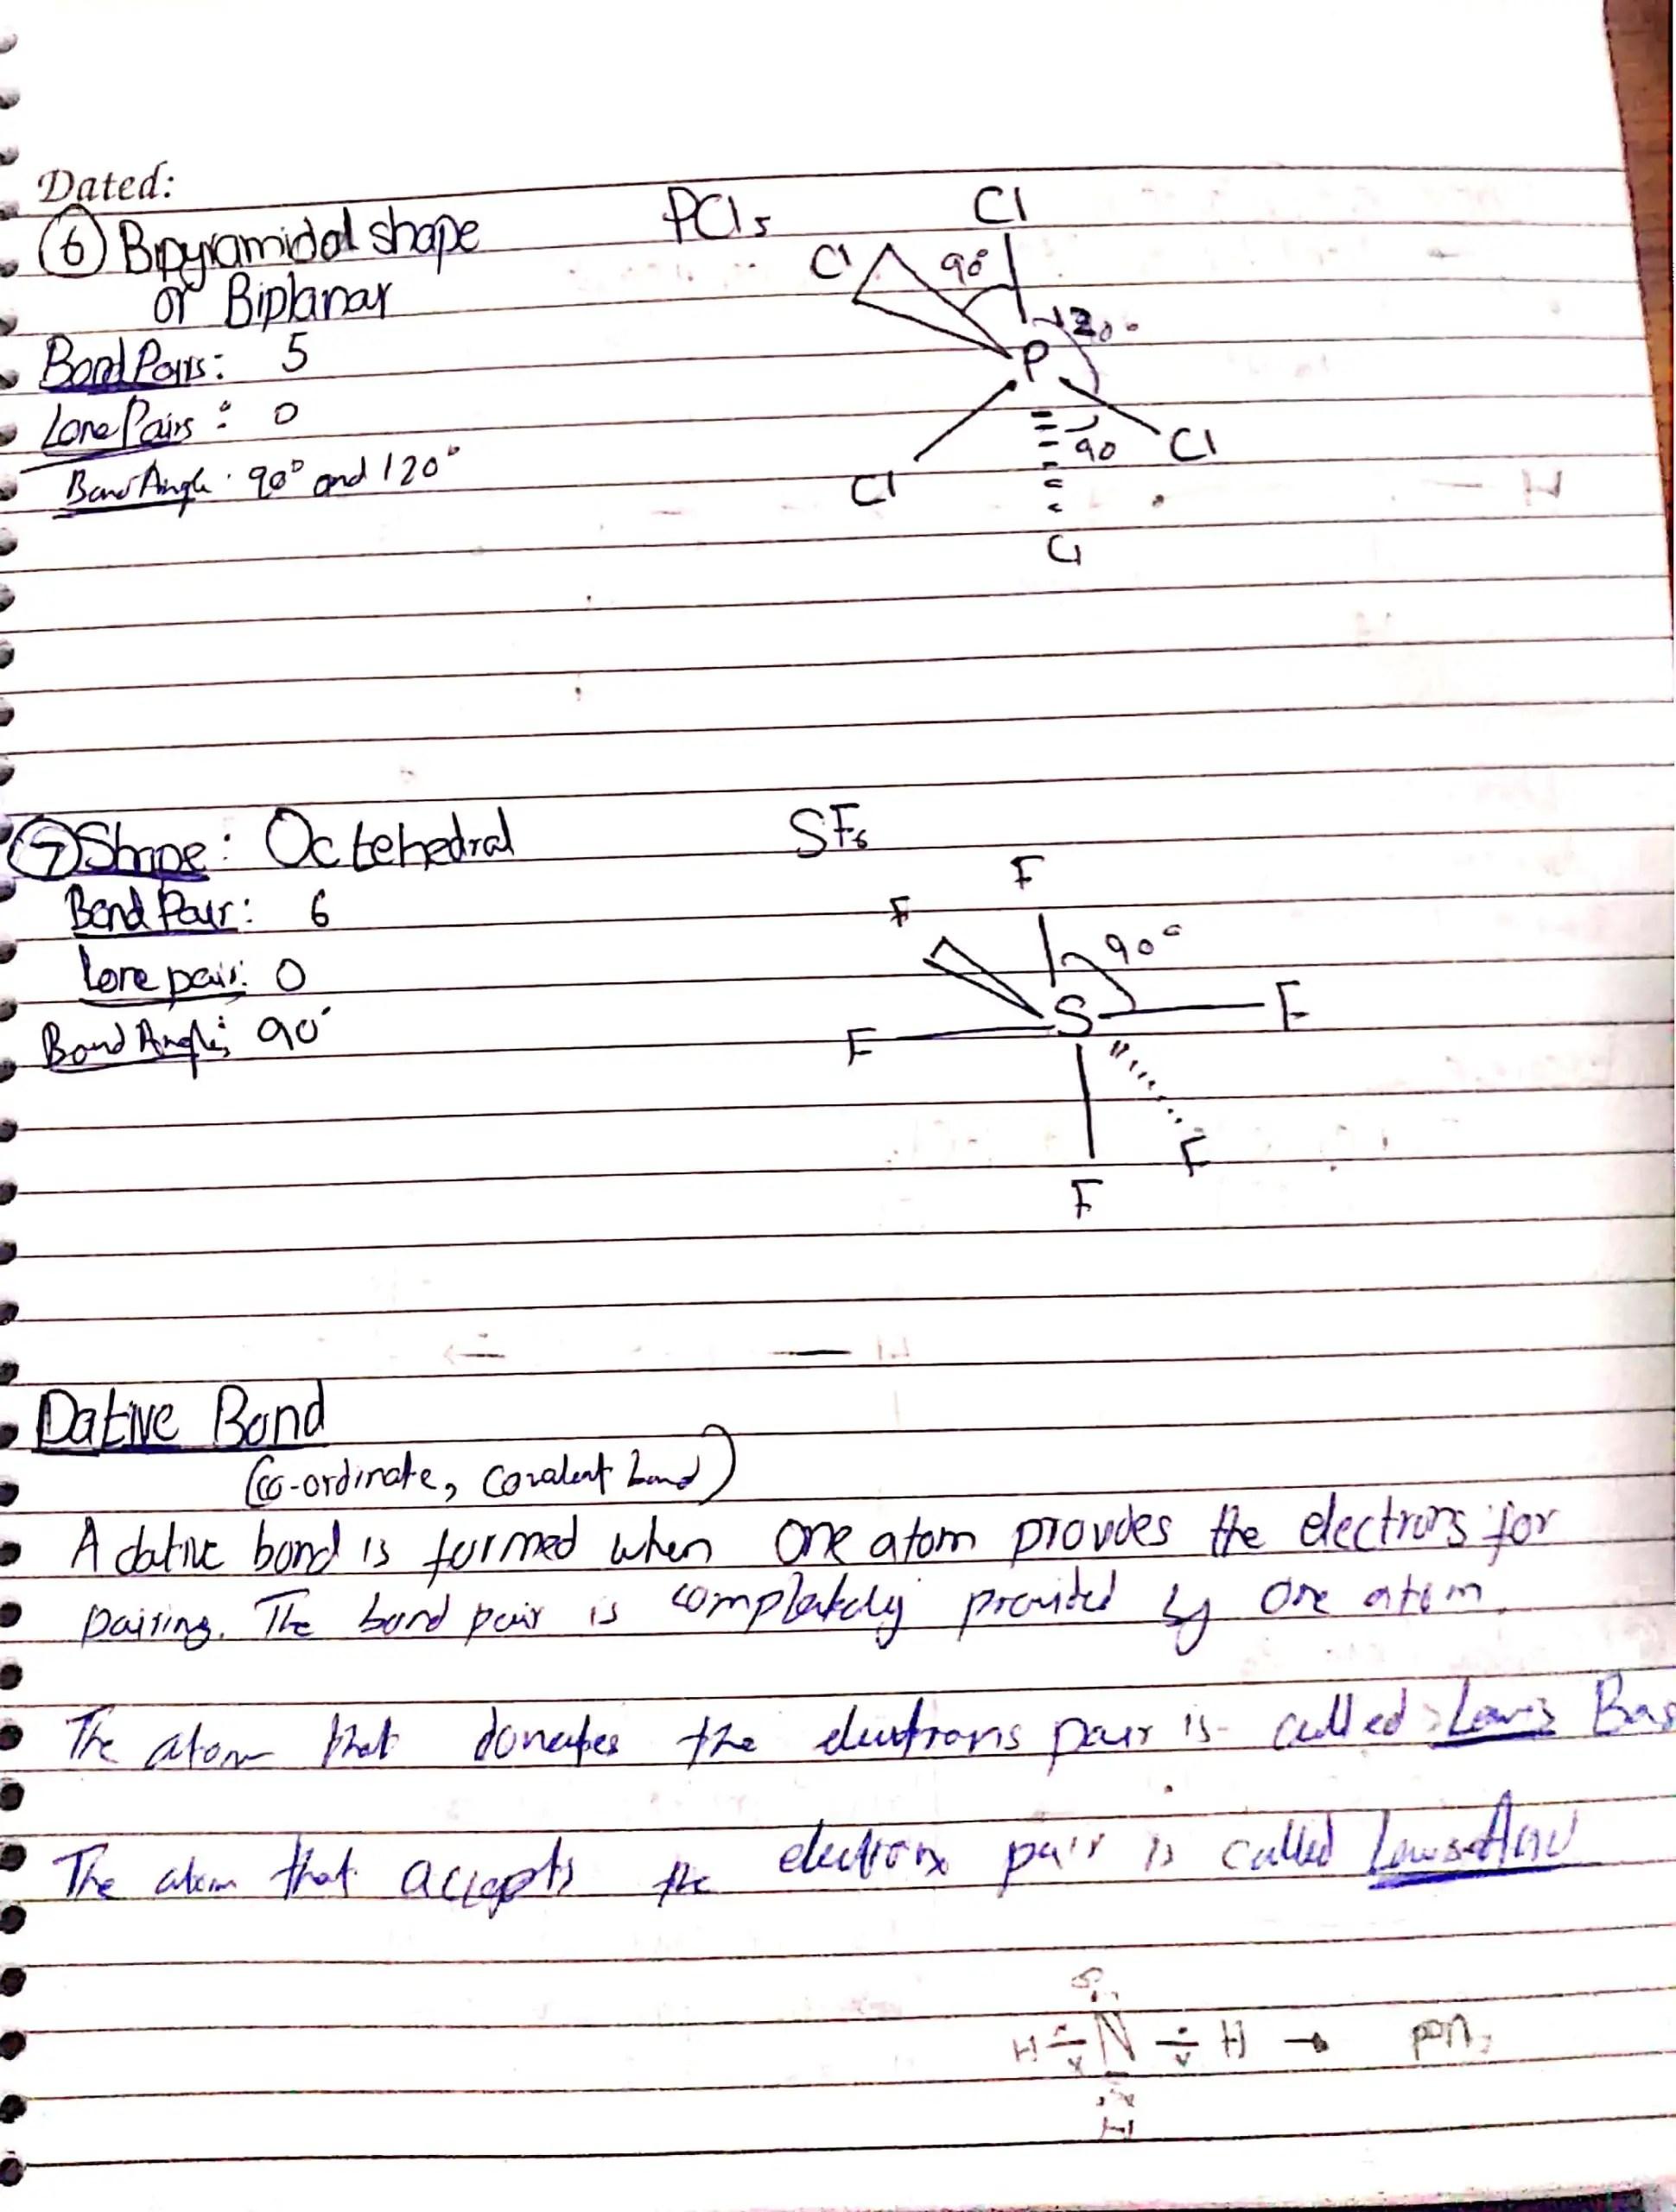 chemical bonding Sir Kashif_28